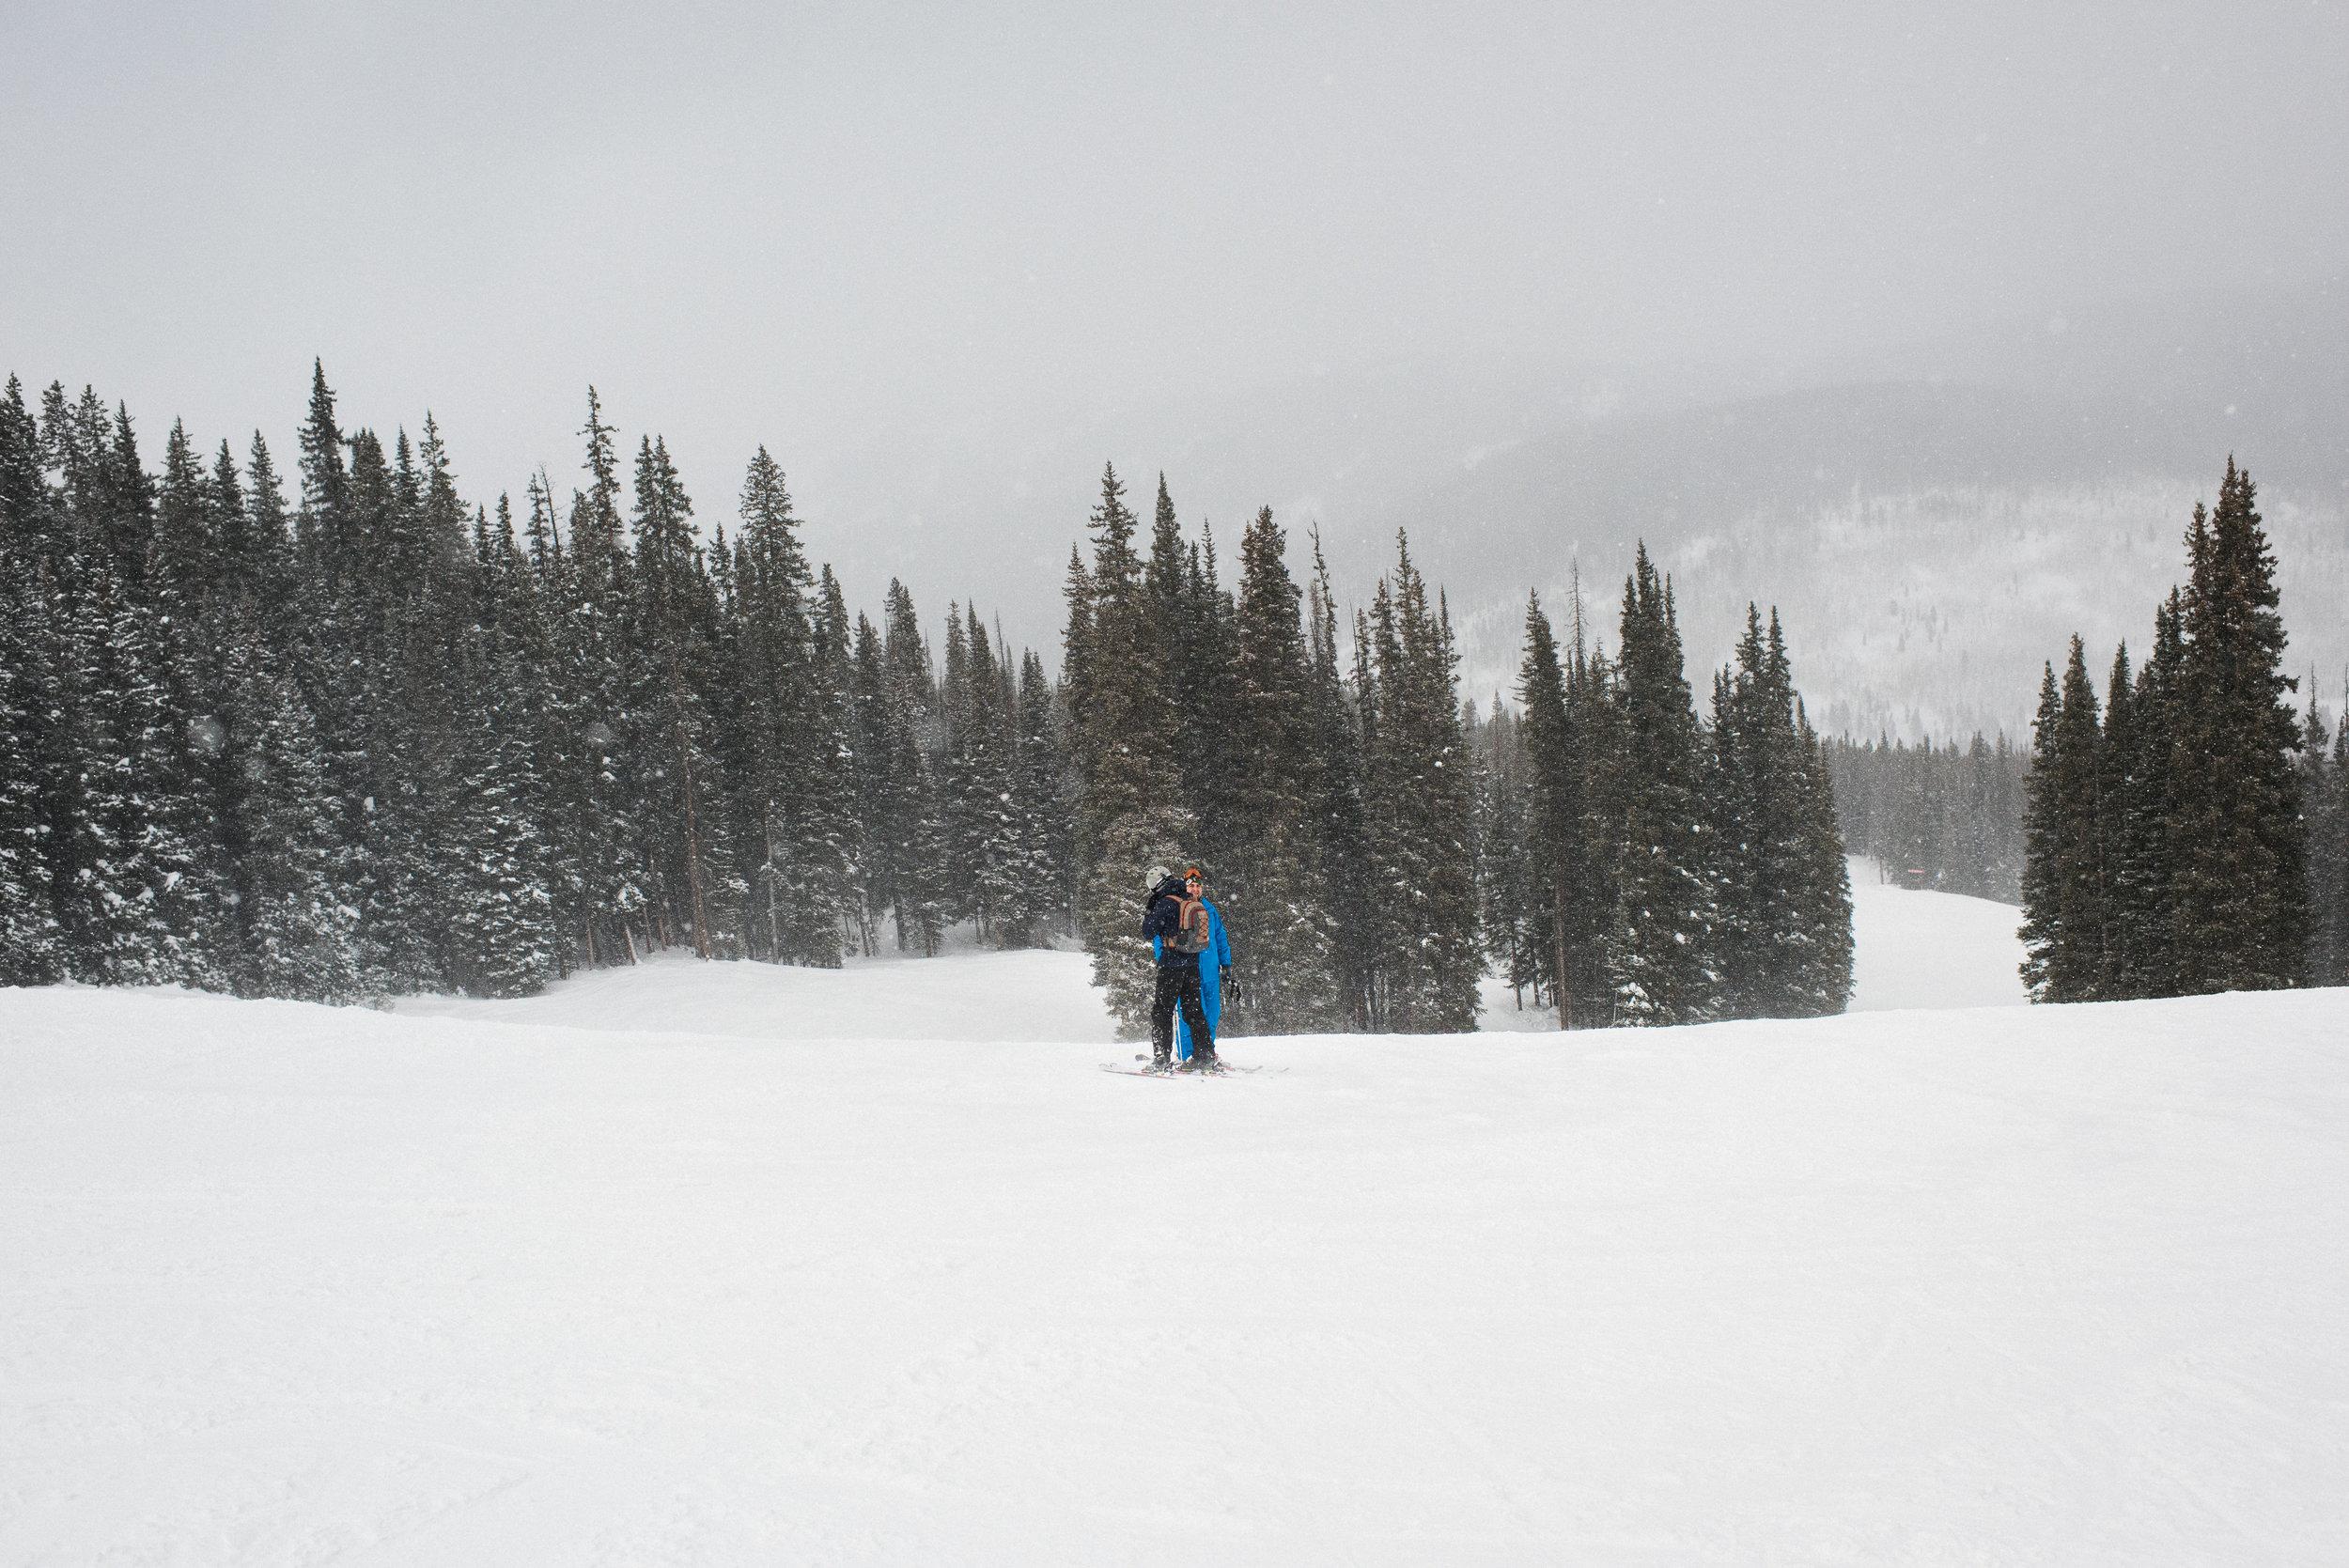 TaraShupe_Outdoor_Photographer_Loweprobags_Colorado_Copper_Mountains_Ski_14.jpg